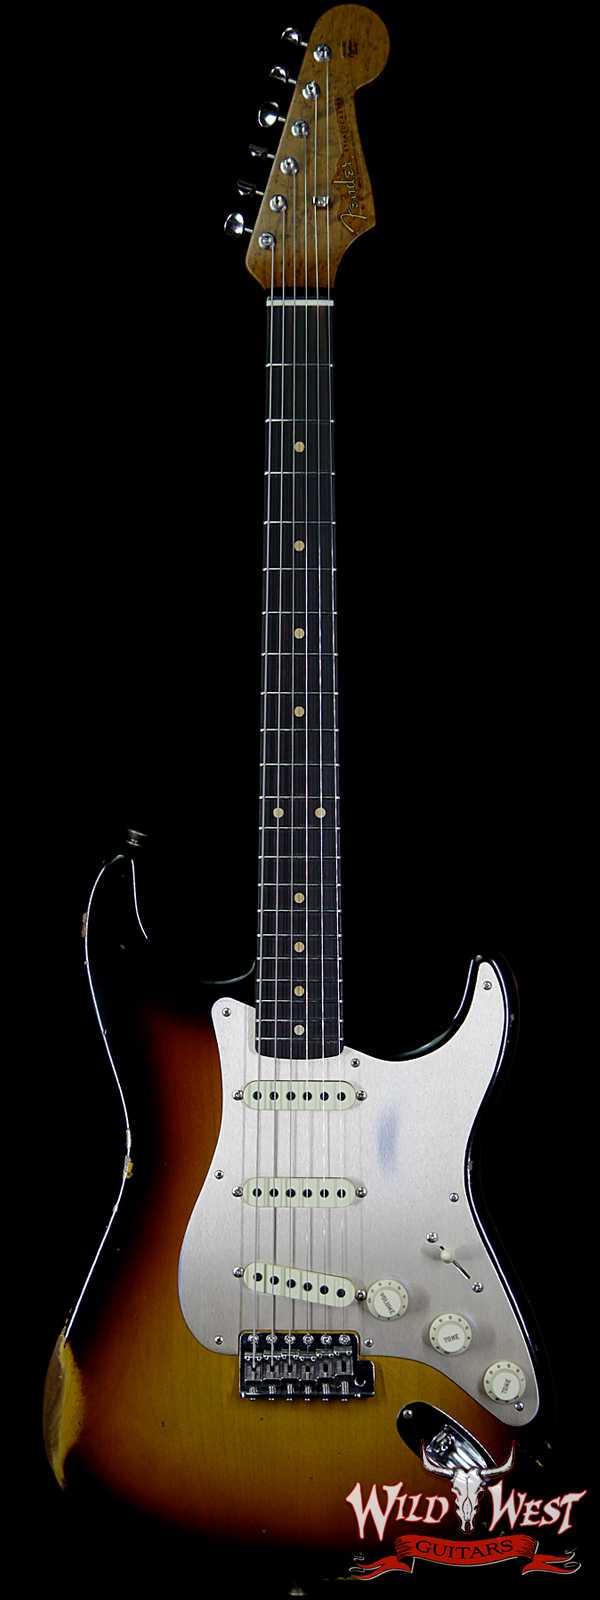 Fender Custom Shop 1960 Stratocaster Relic Roasted AAA Birdseye Neck Rosewood Board 3 Tone Sunburst